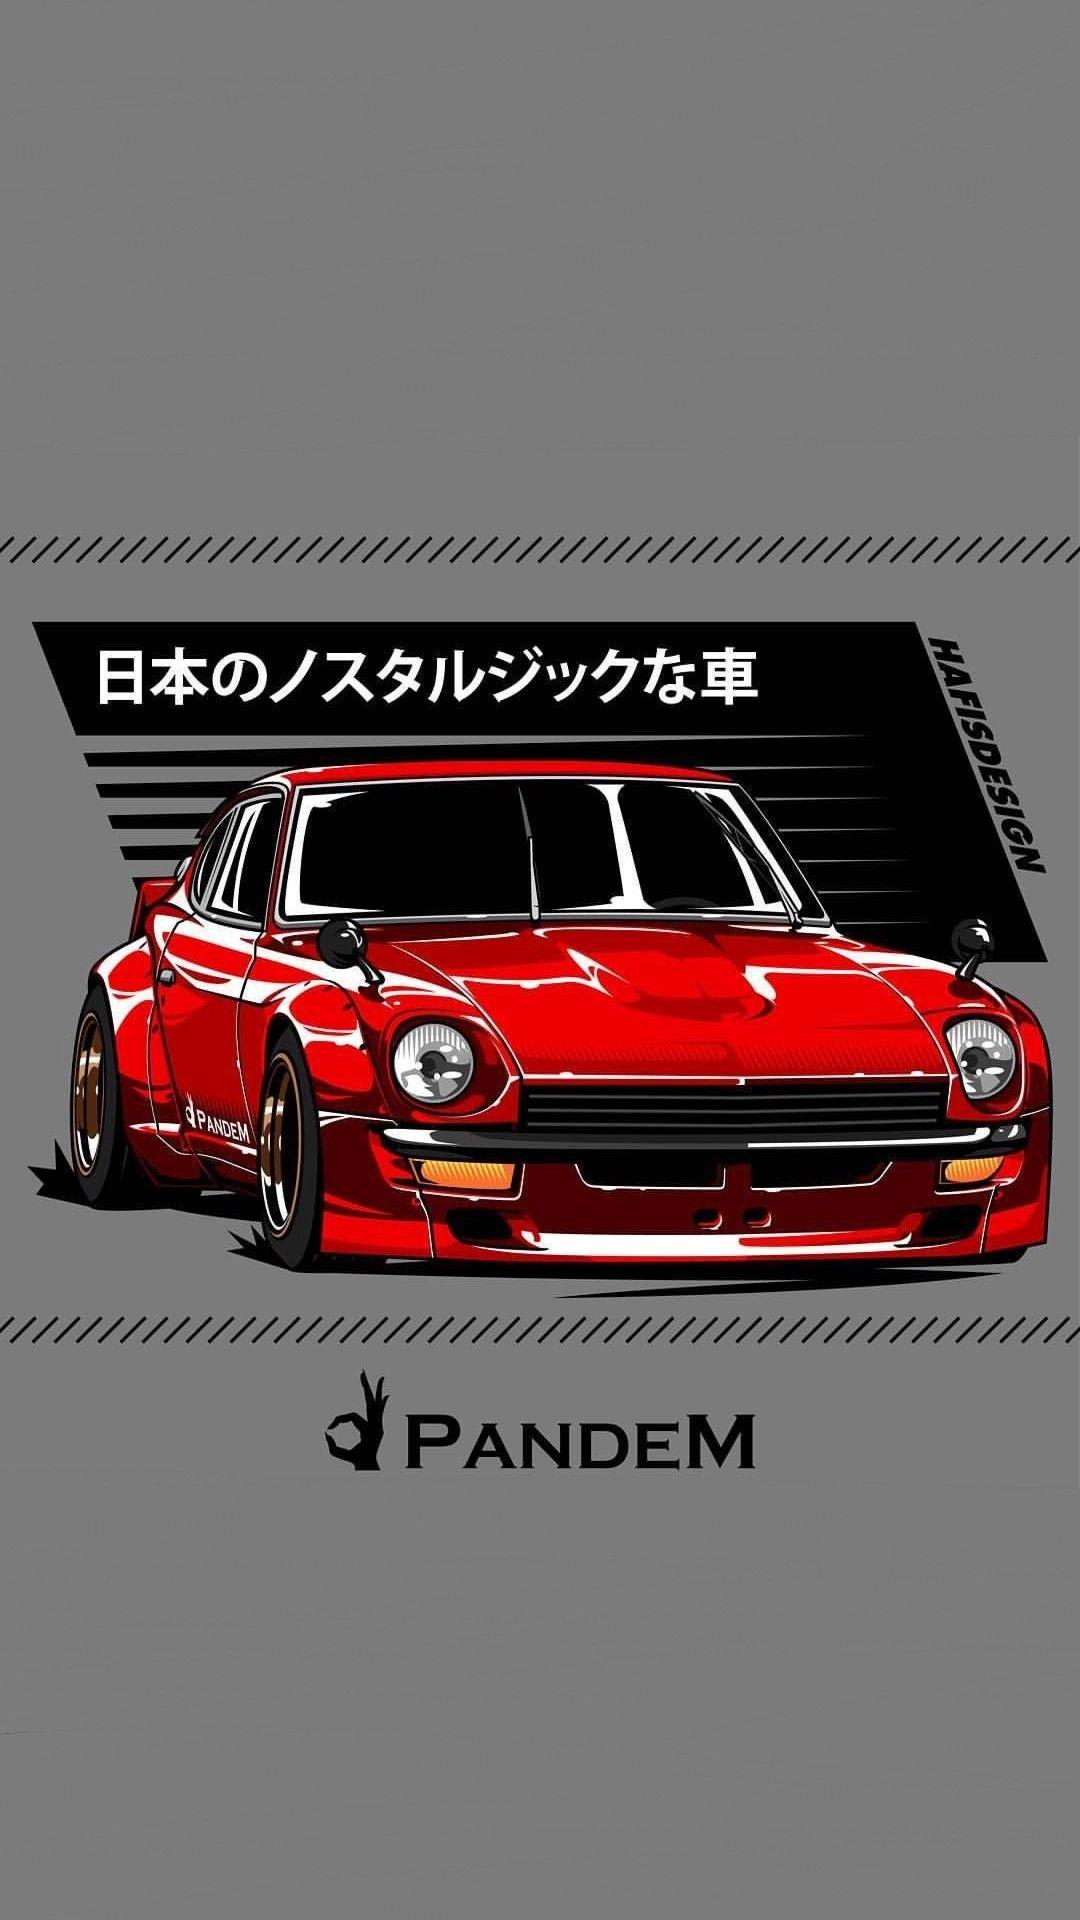 Pin By Mohamed Tarek On Cars Wallpaper Art Art Cars Street Racing Cars Automotive Artwork